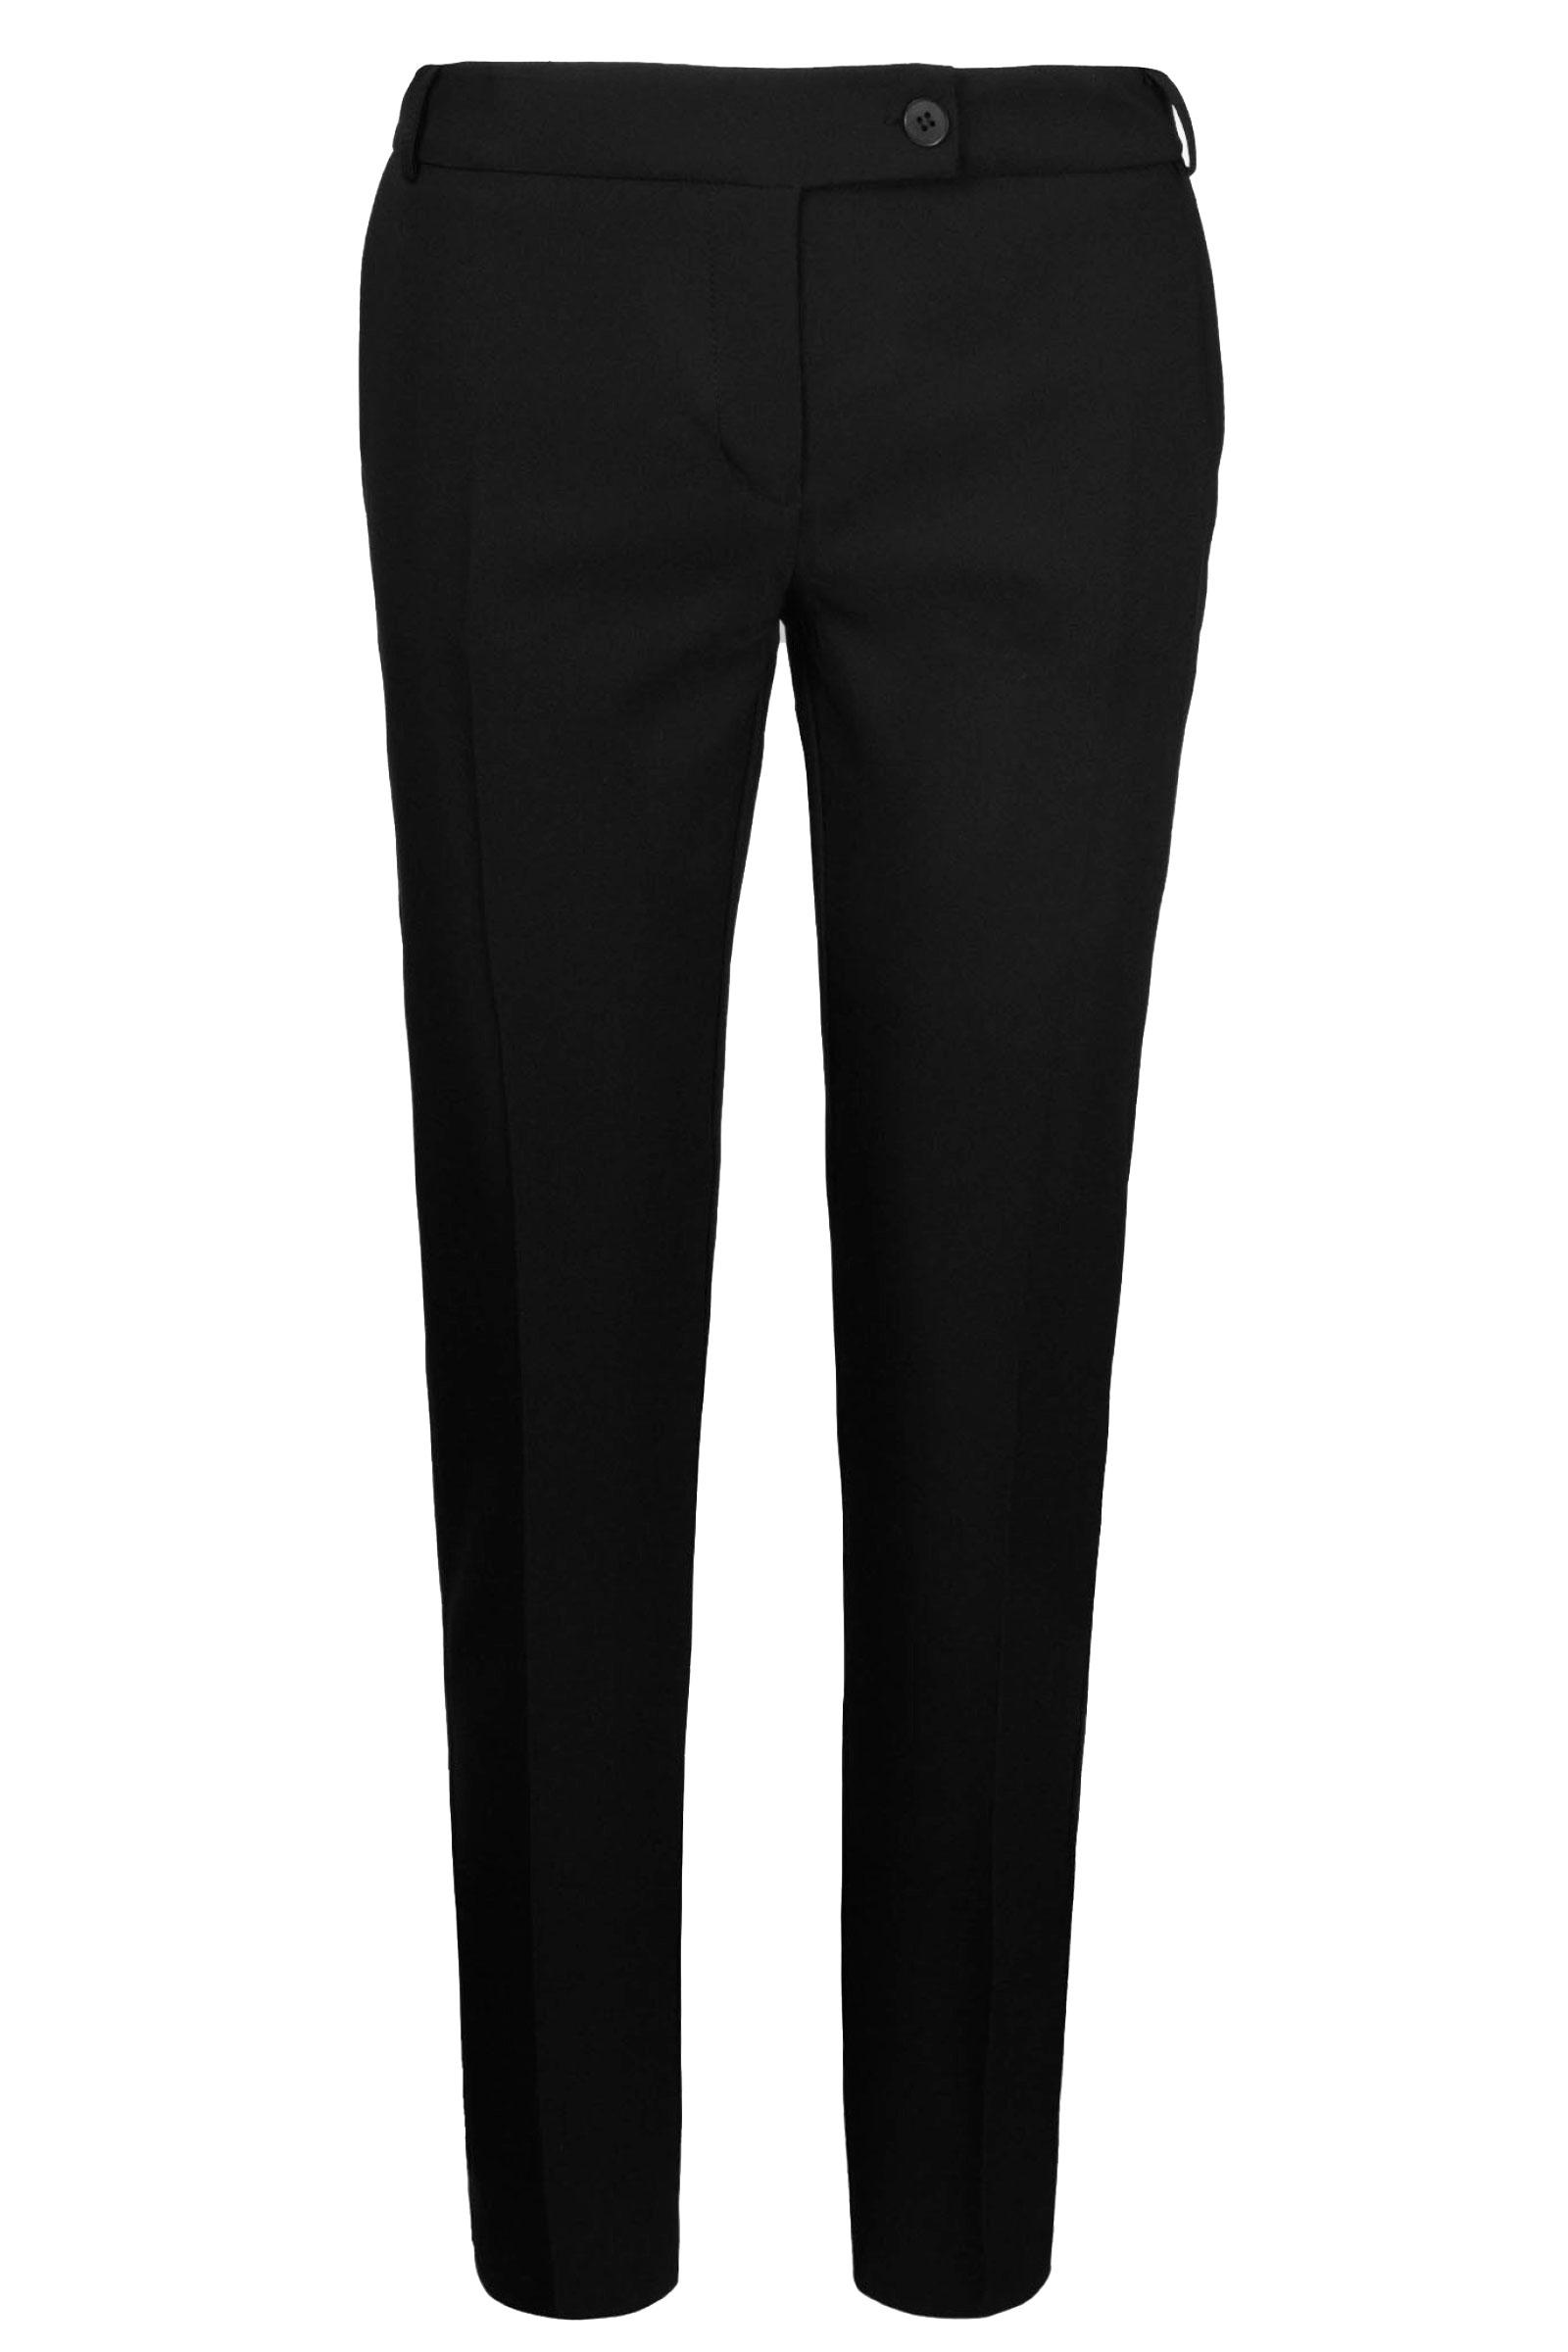 RINASCIMENTO Pantalone Donna RINASCIMENTO   Pantalone   CFC0102428003B001